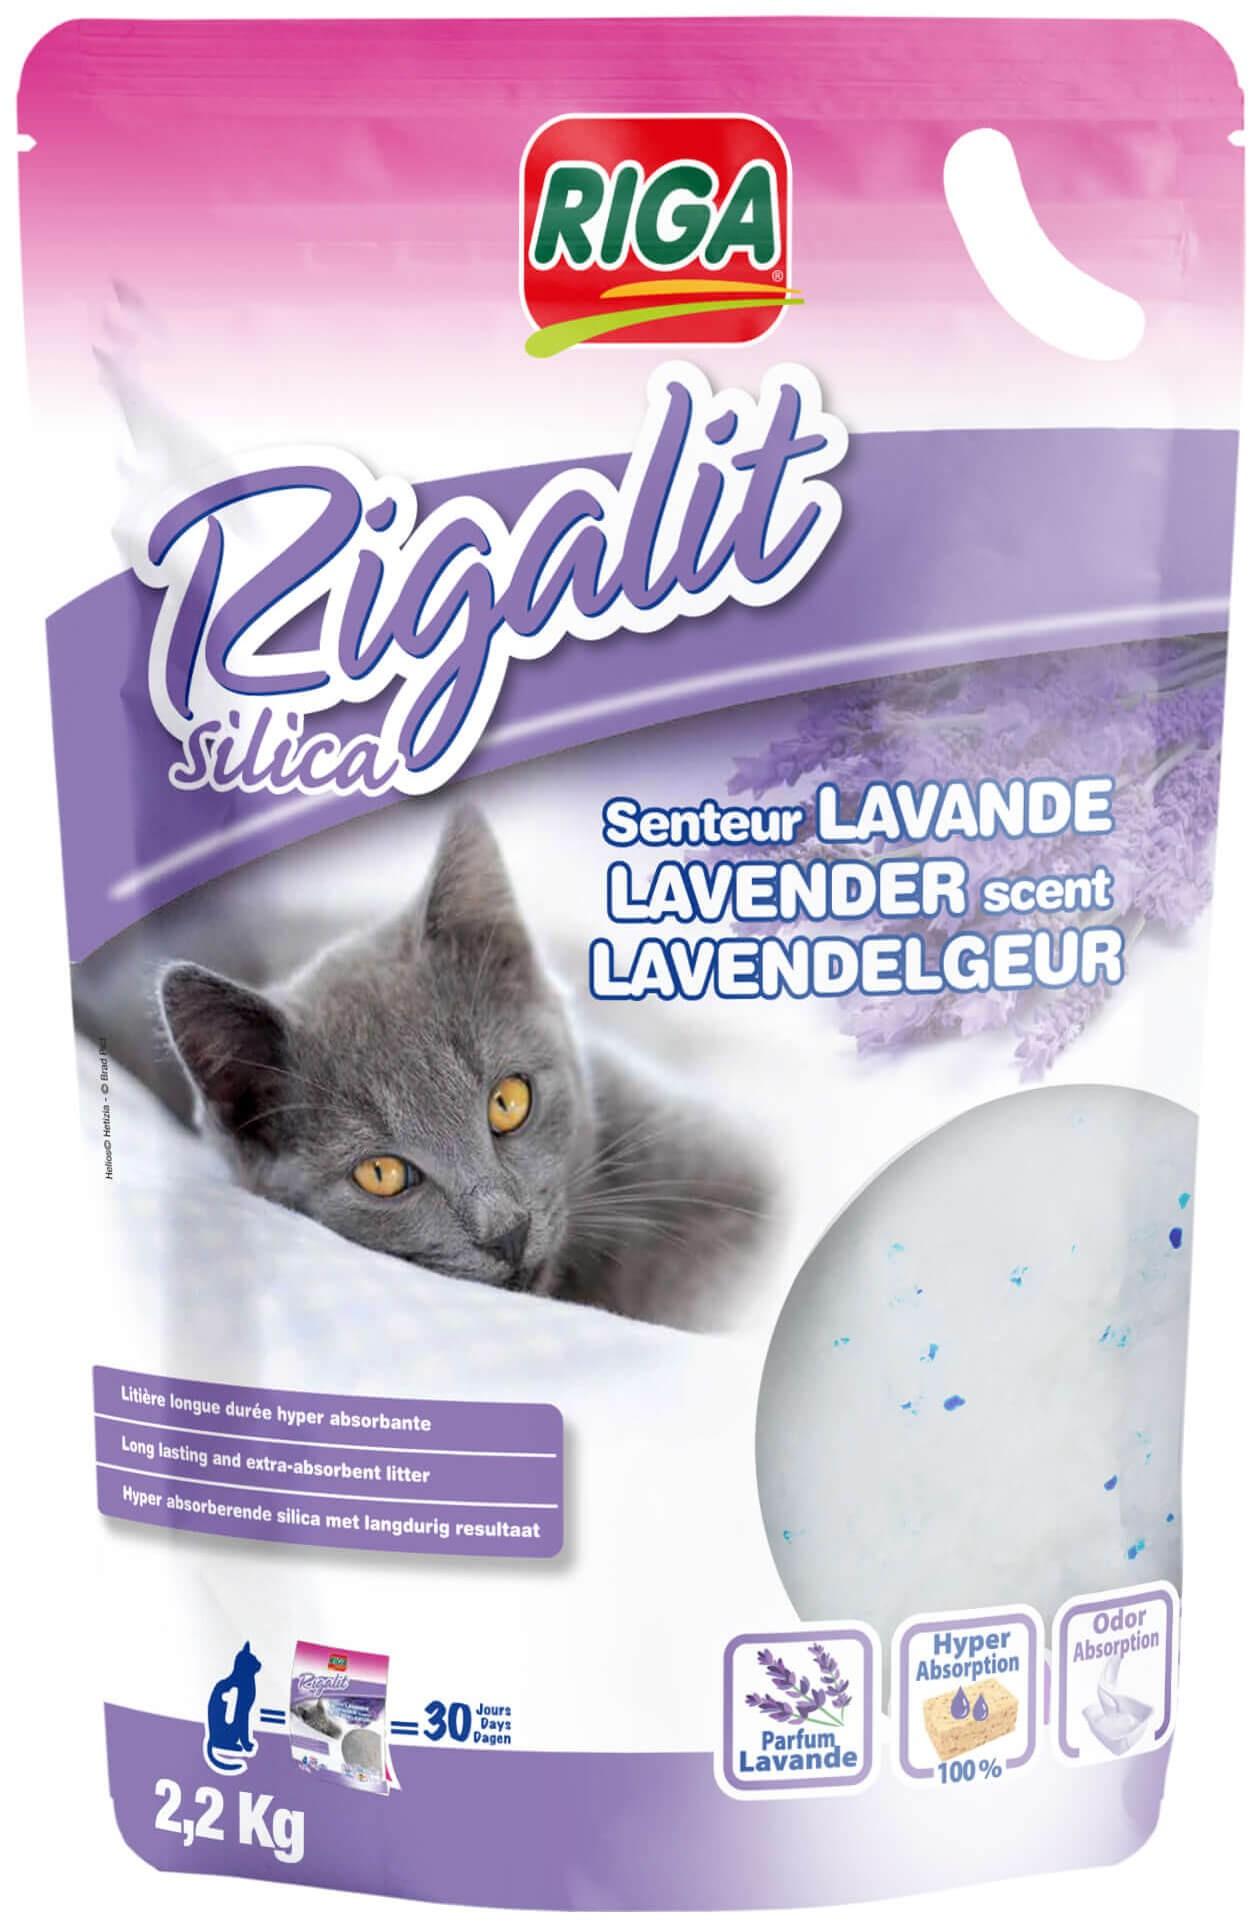 Rigalit Lavande